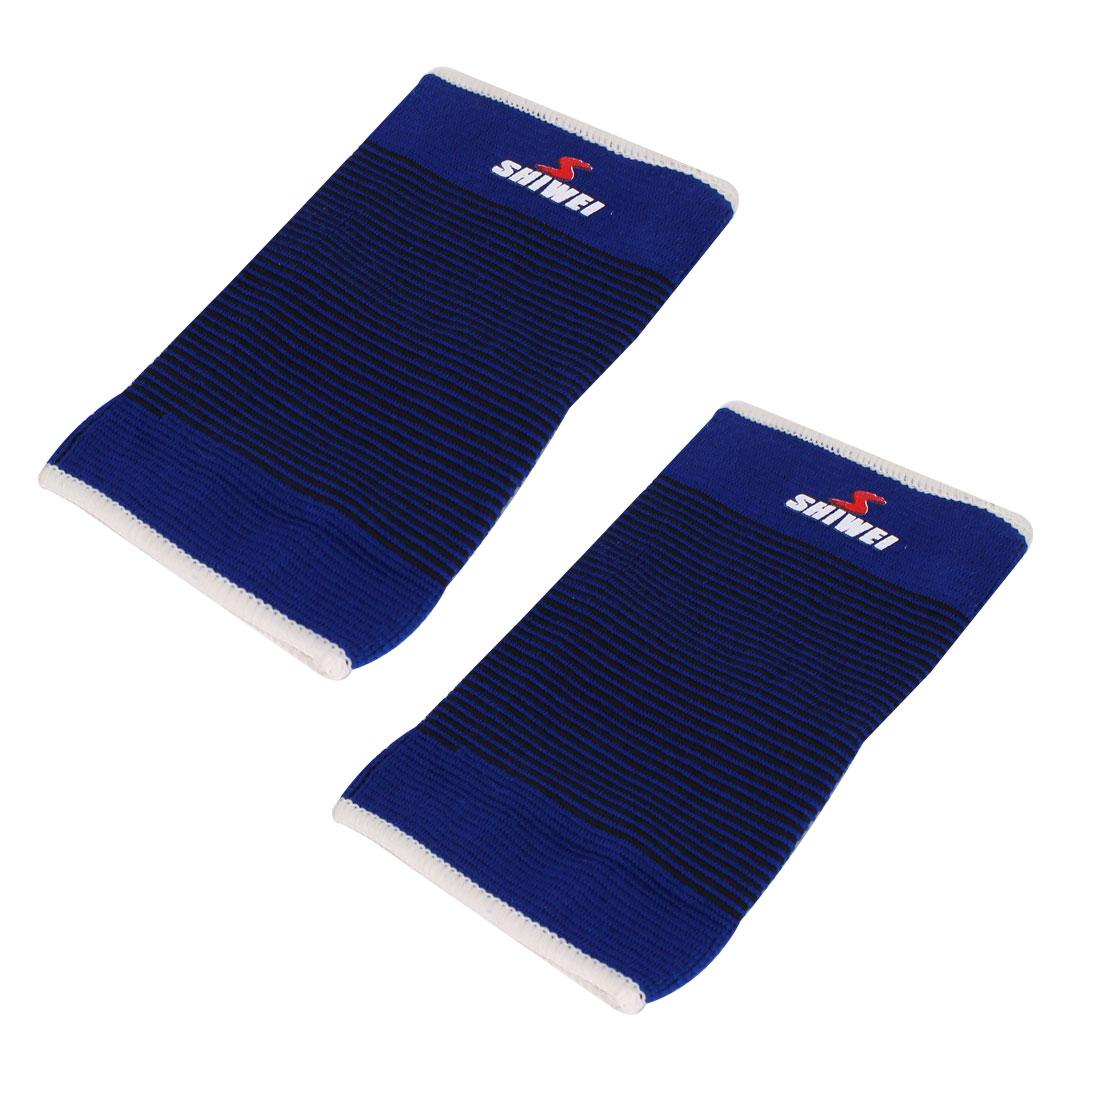 Pair Blue Black Striped Elastic Sleeve Leg Thigh Protector Support Brace Guard